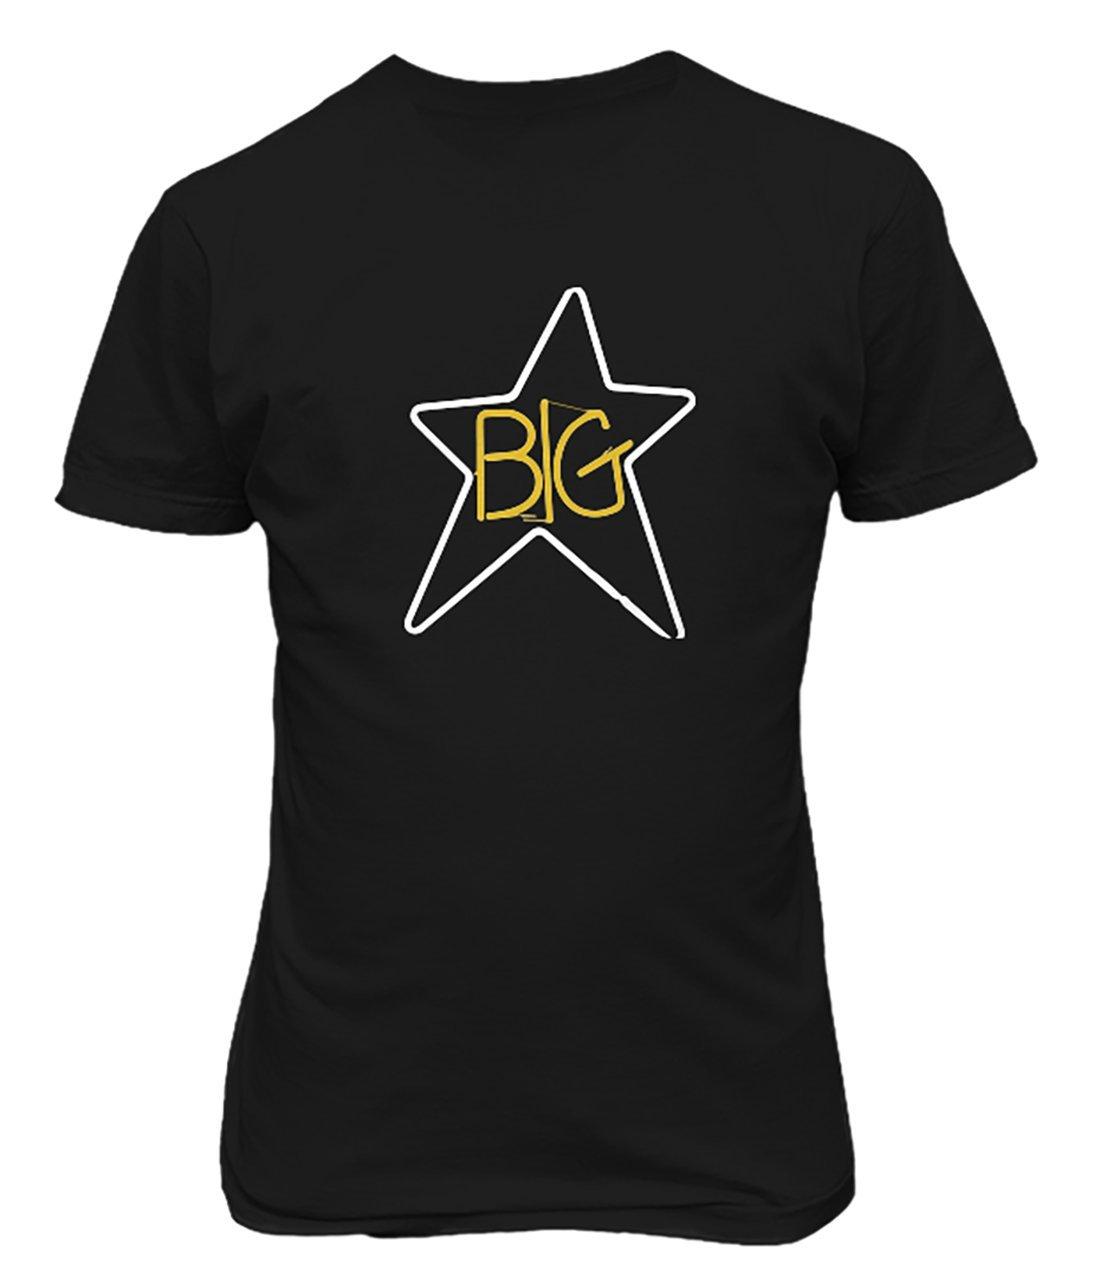 Big Star Band Rock Music T Shirt Music 89